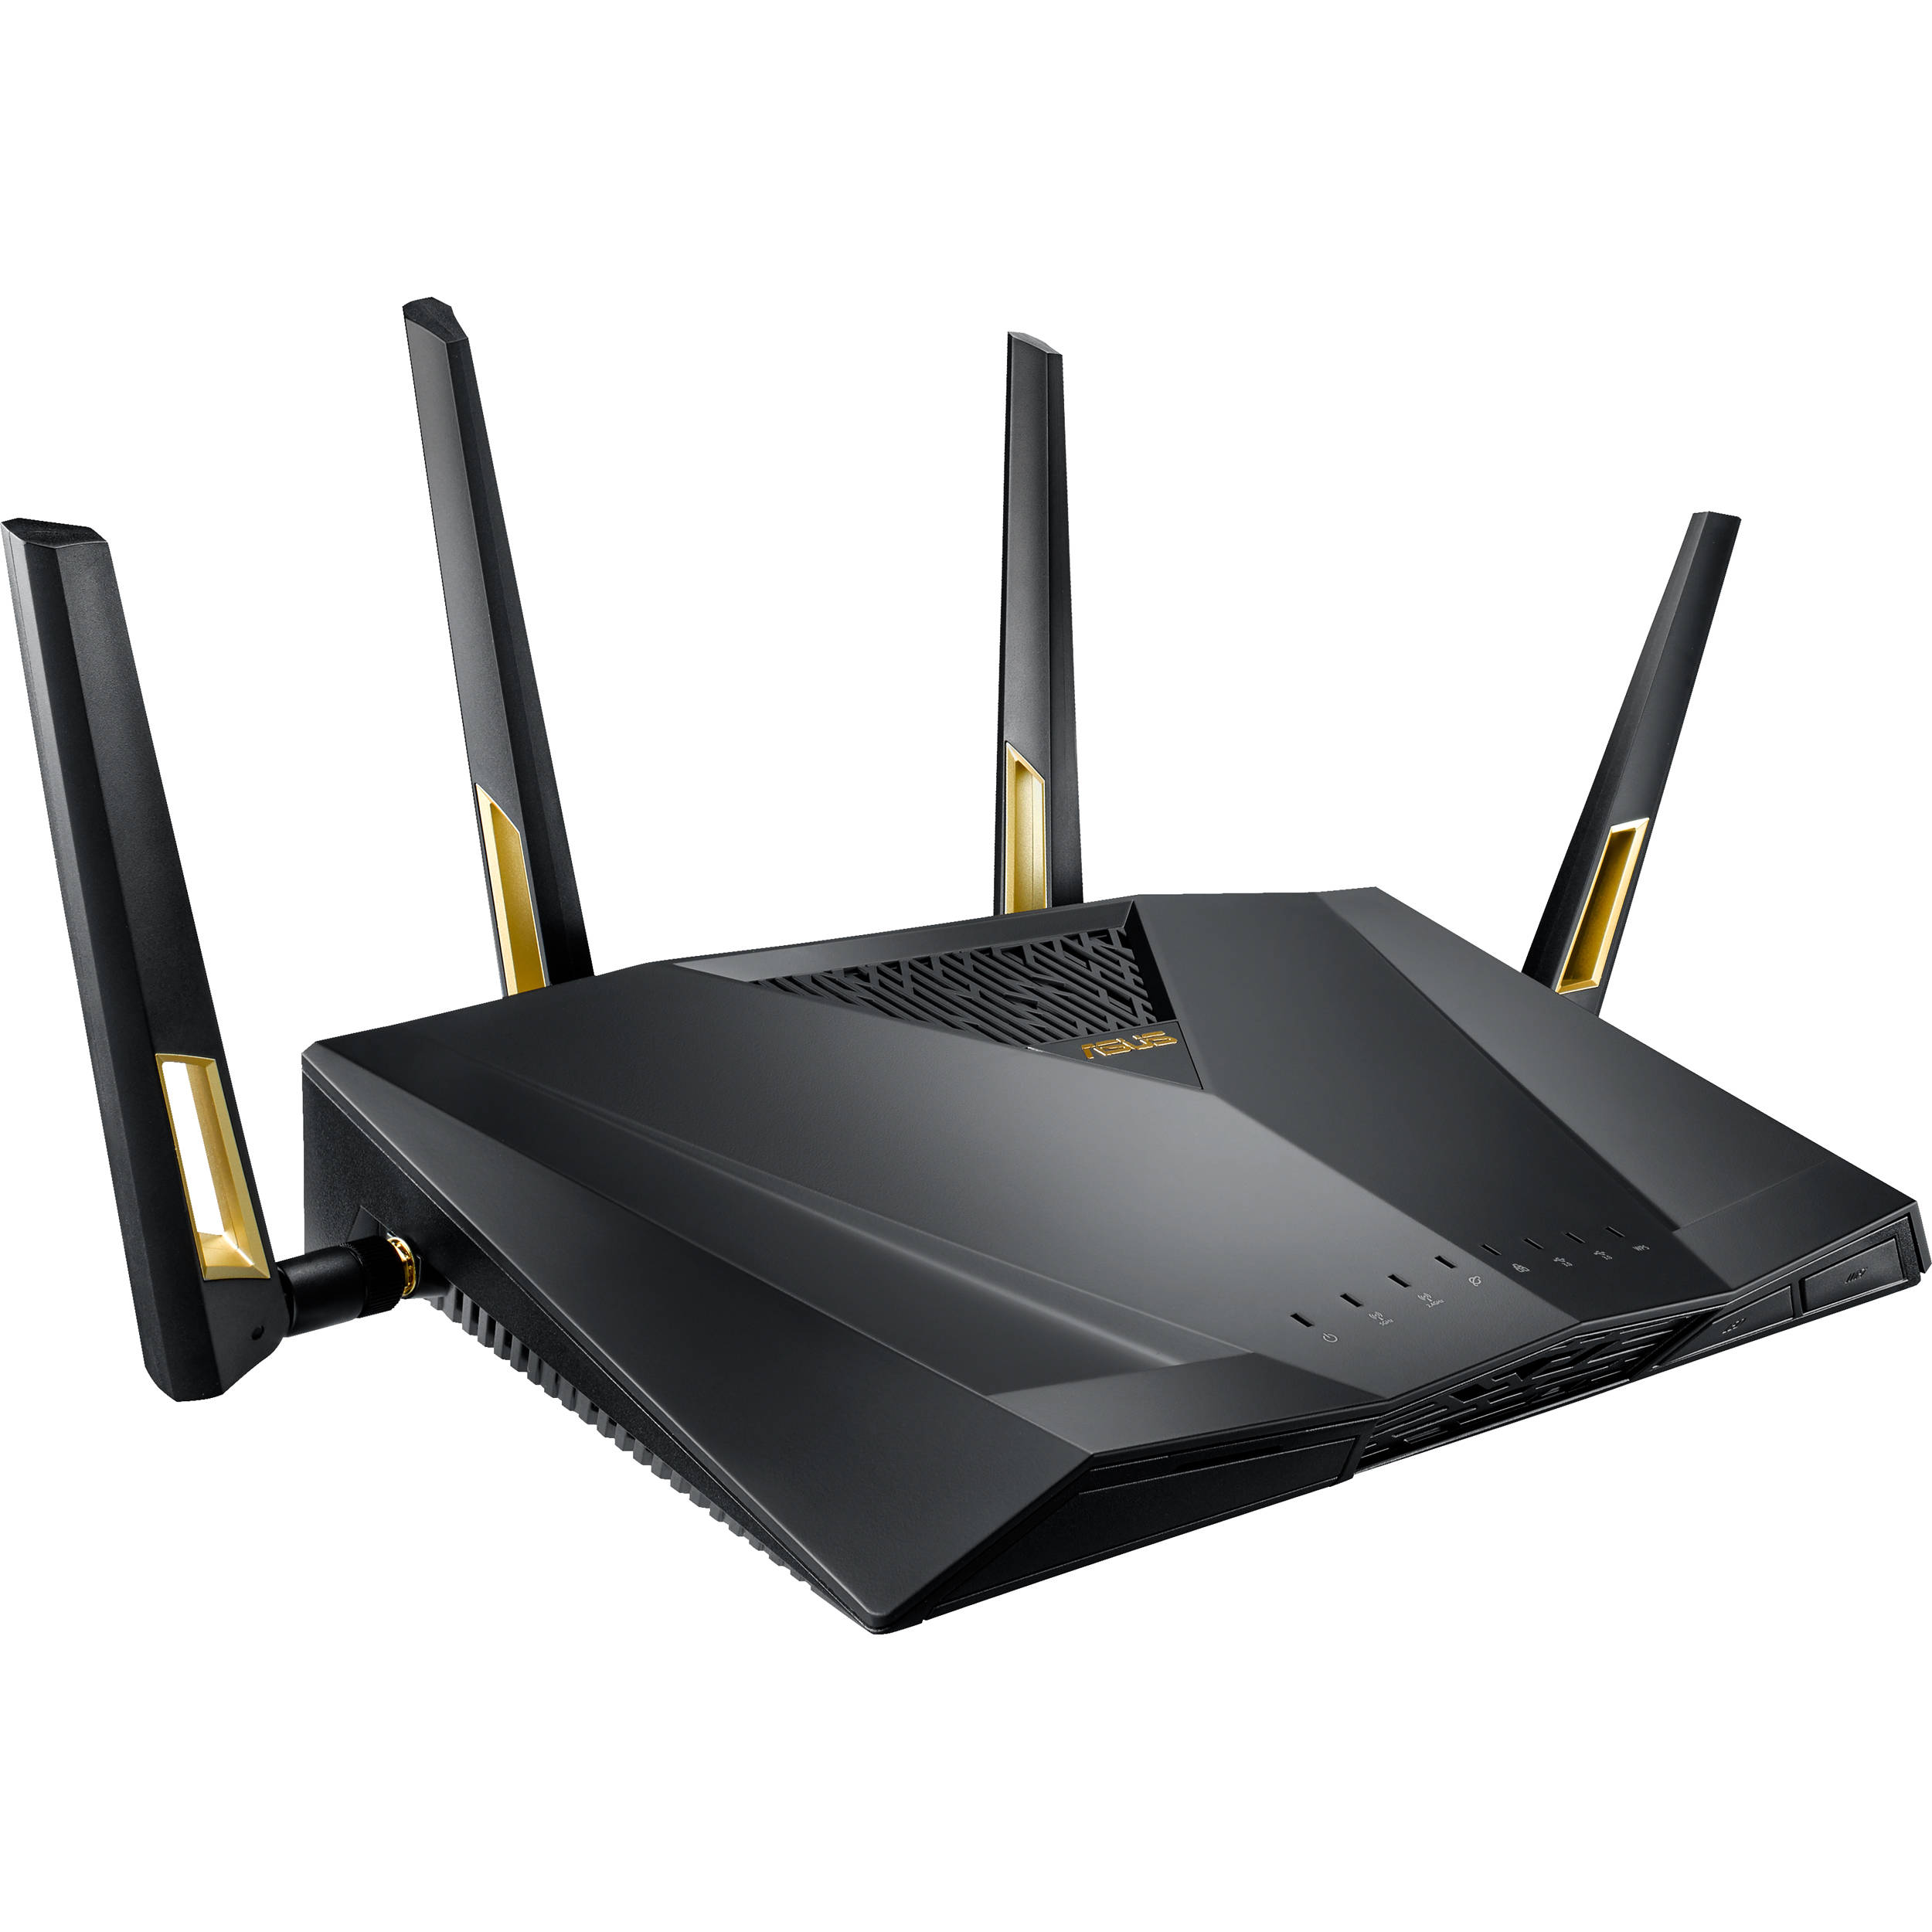 ASUS RT-AX88U AX6000 Dual-Band Gigabit Router